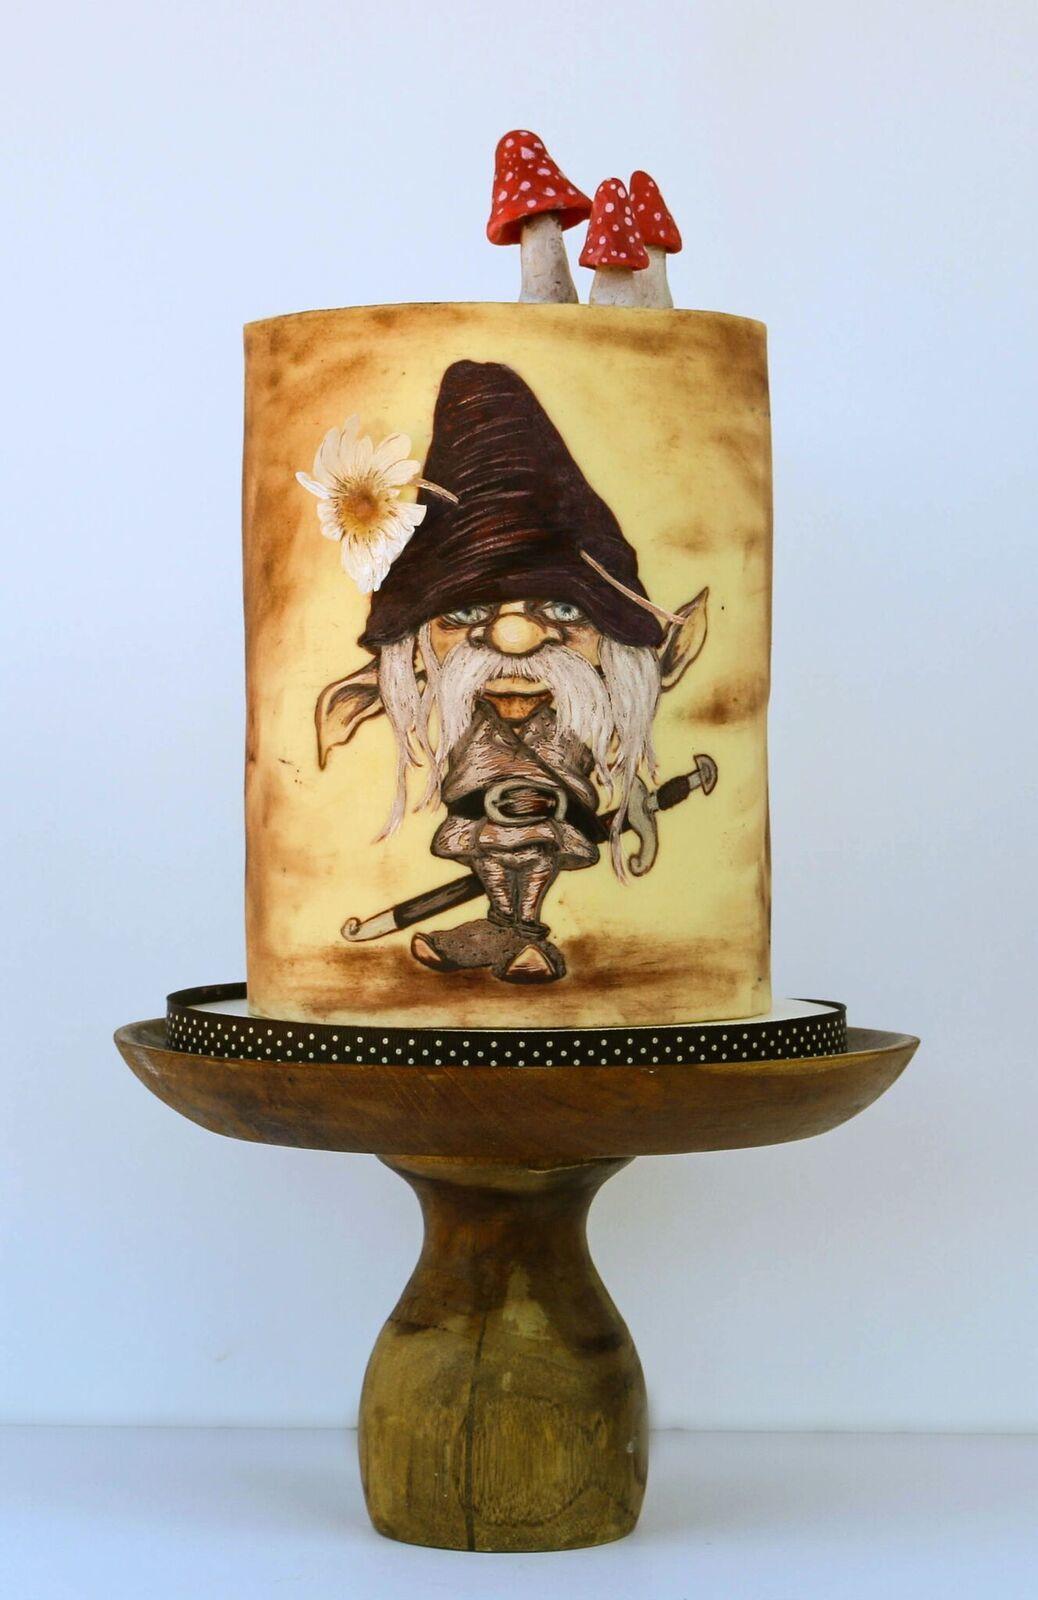 Woodland gnome cake